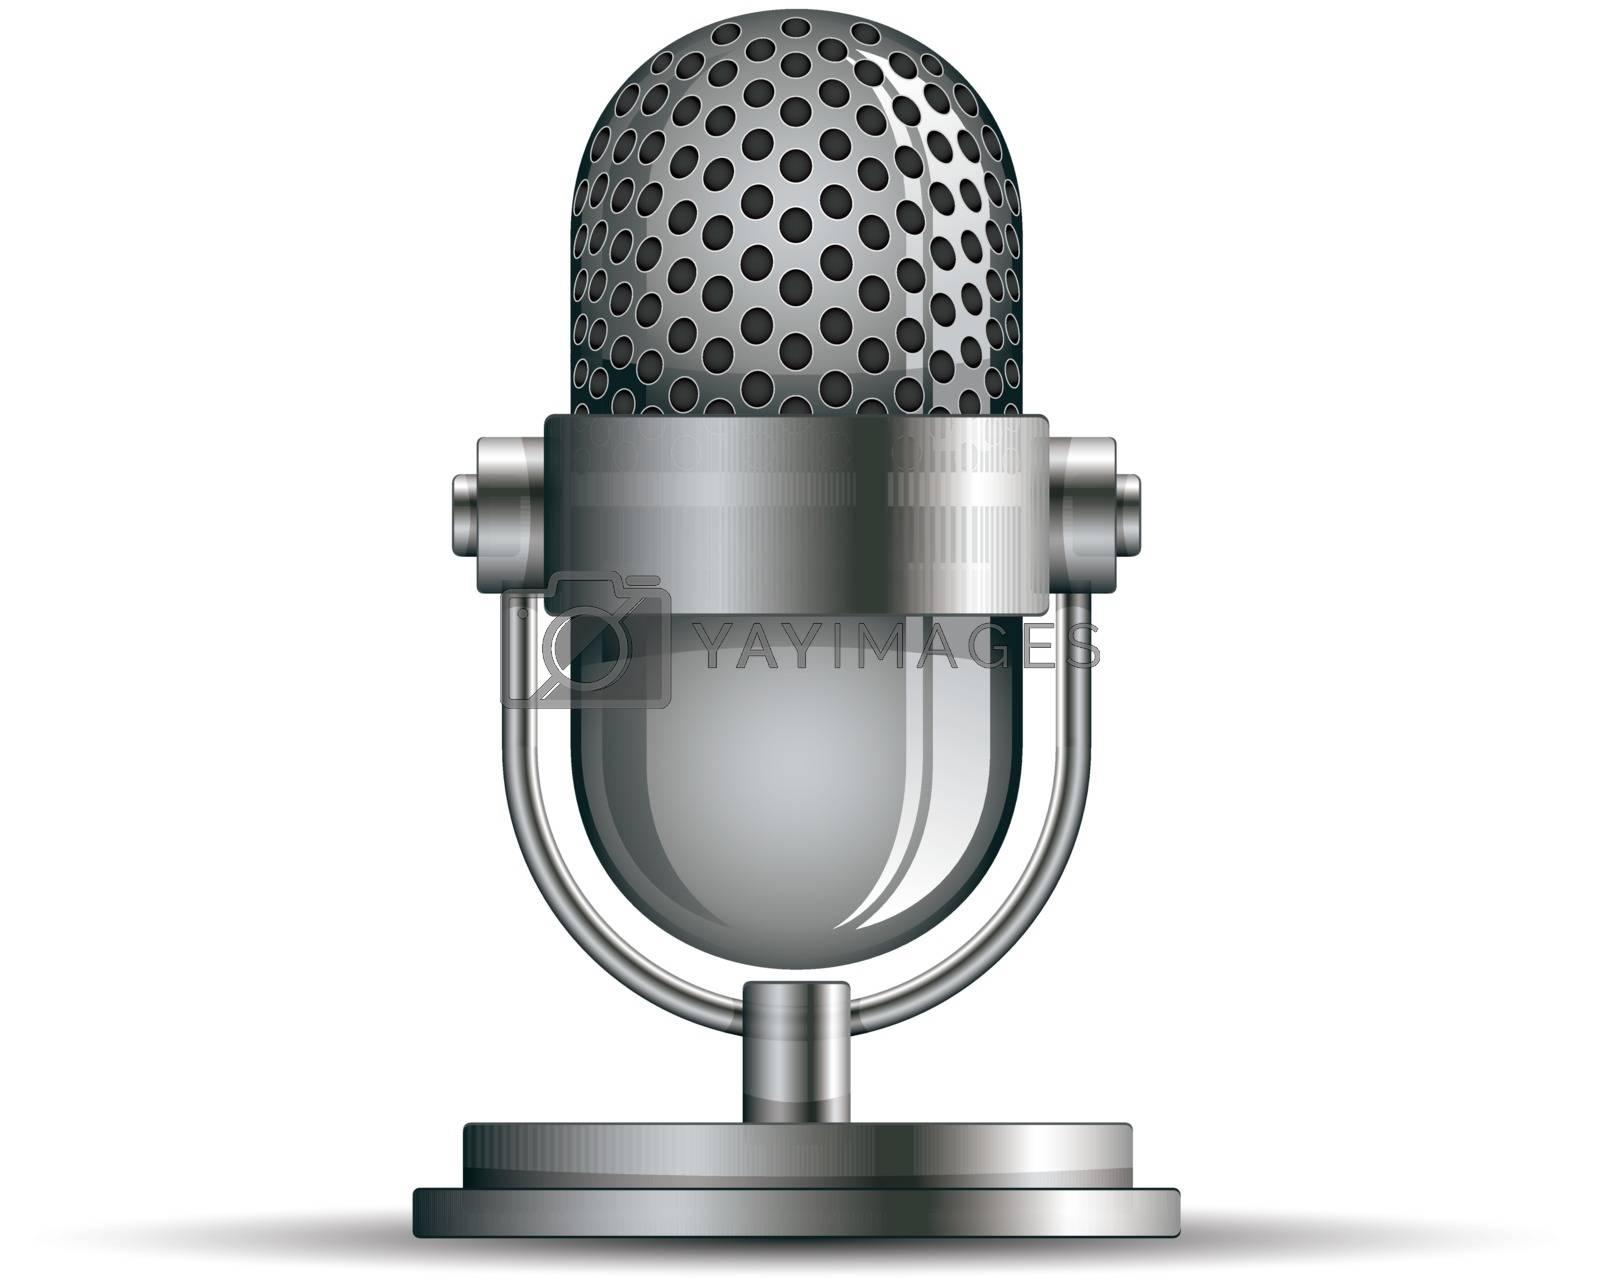 Microphone icon, vector illustration.